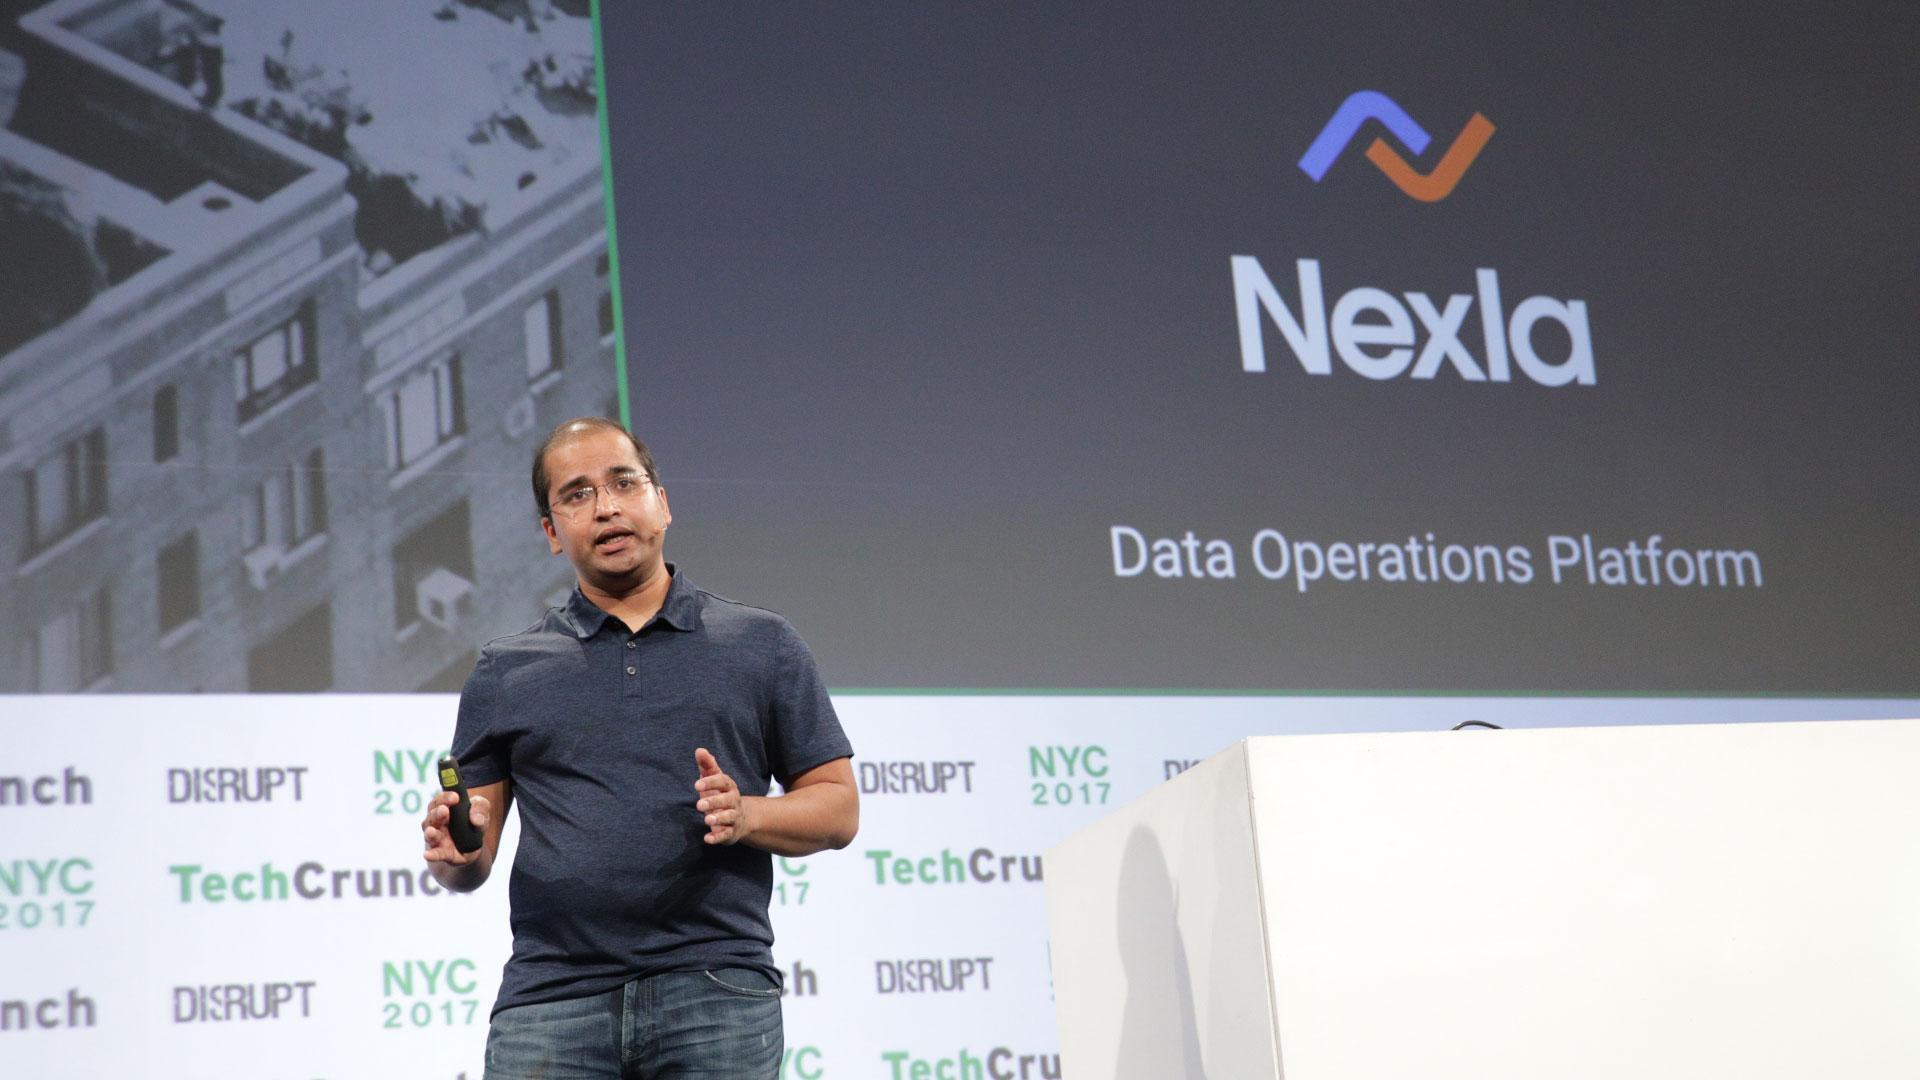 Nexla: A Datacenter for Actual Data